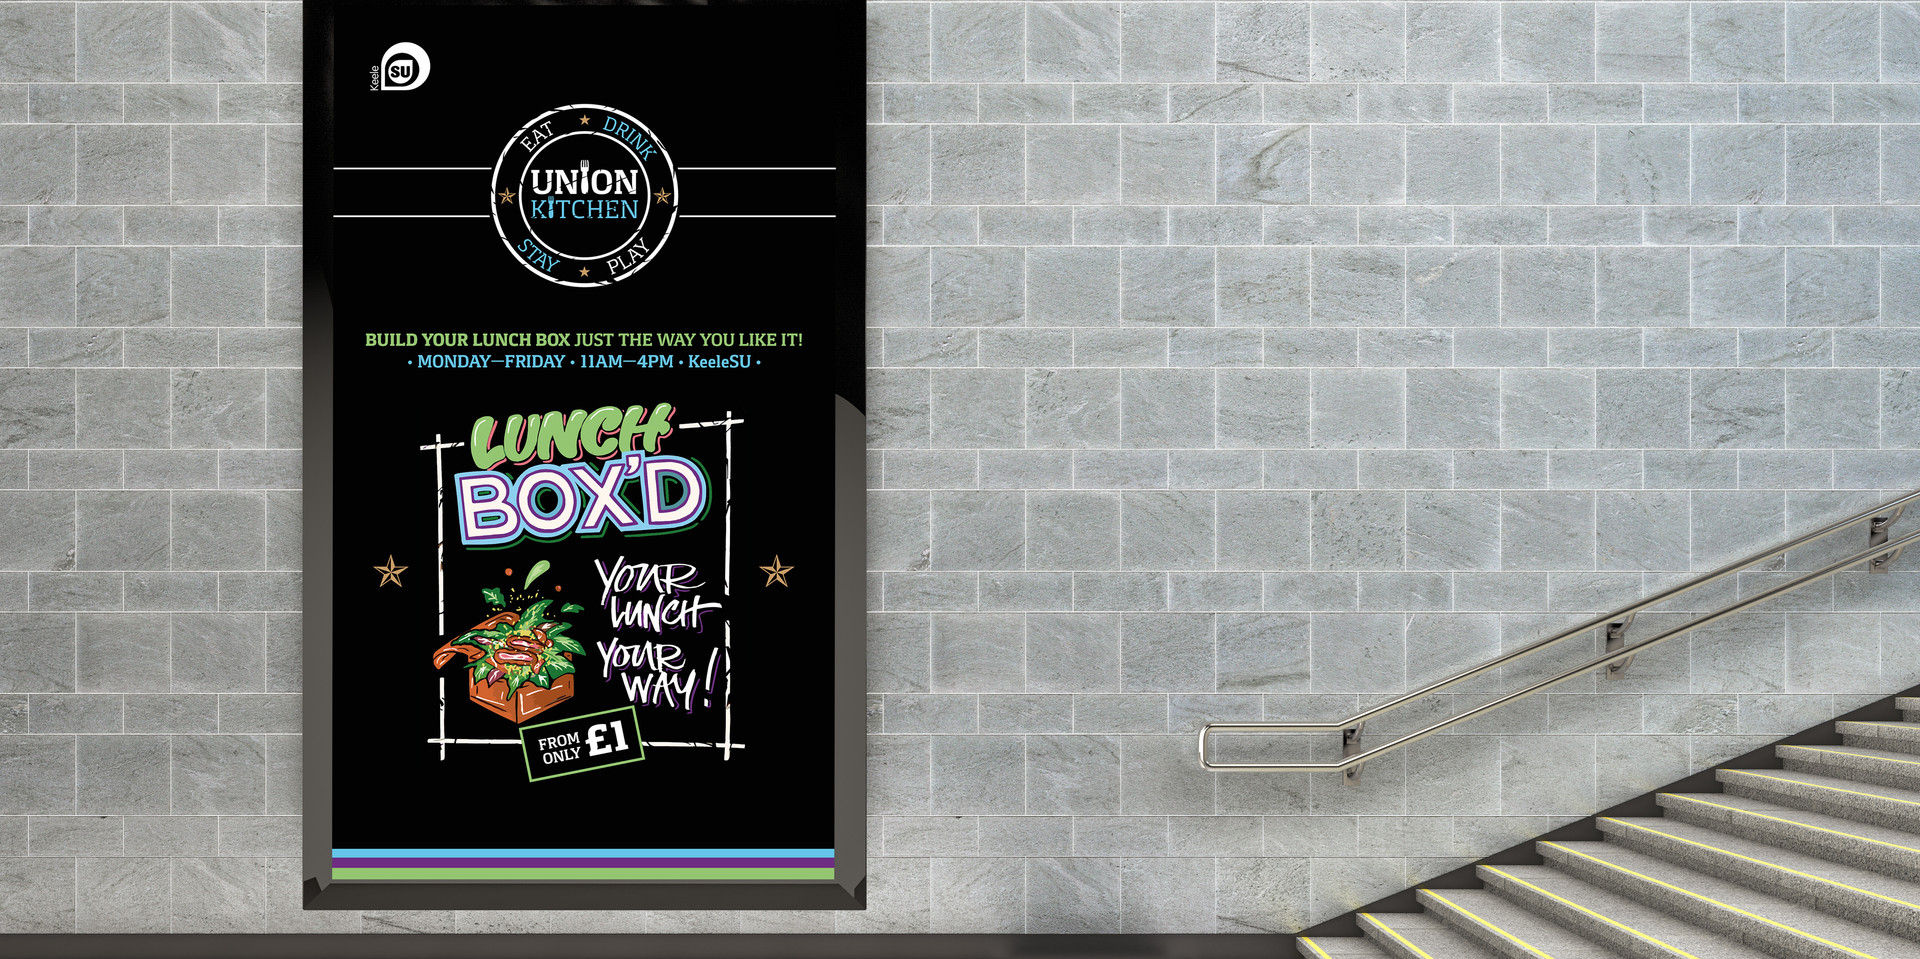 Union Kitchen - Lunch Box'd: Vertical TV Screen